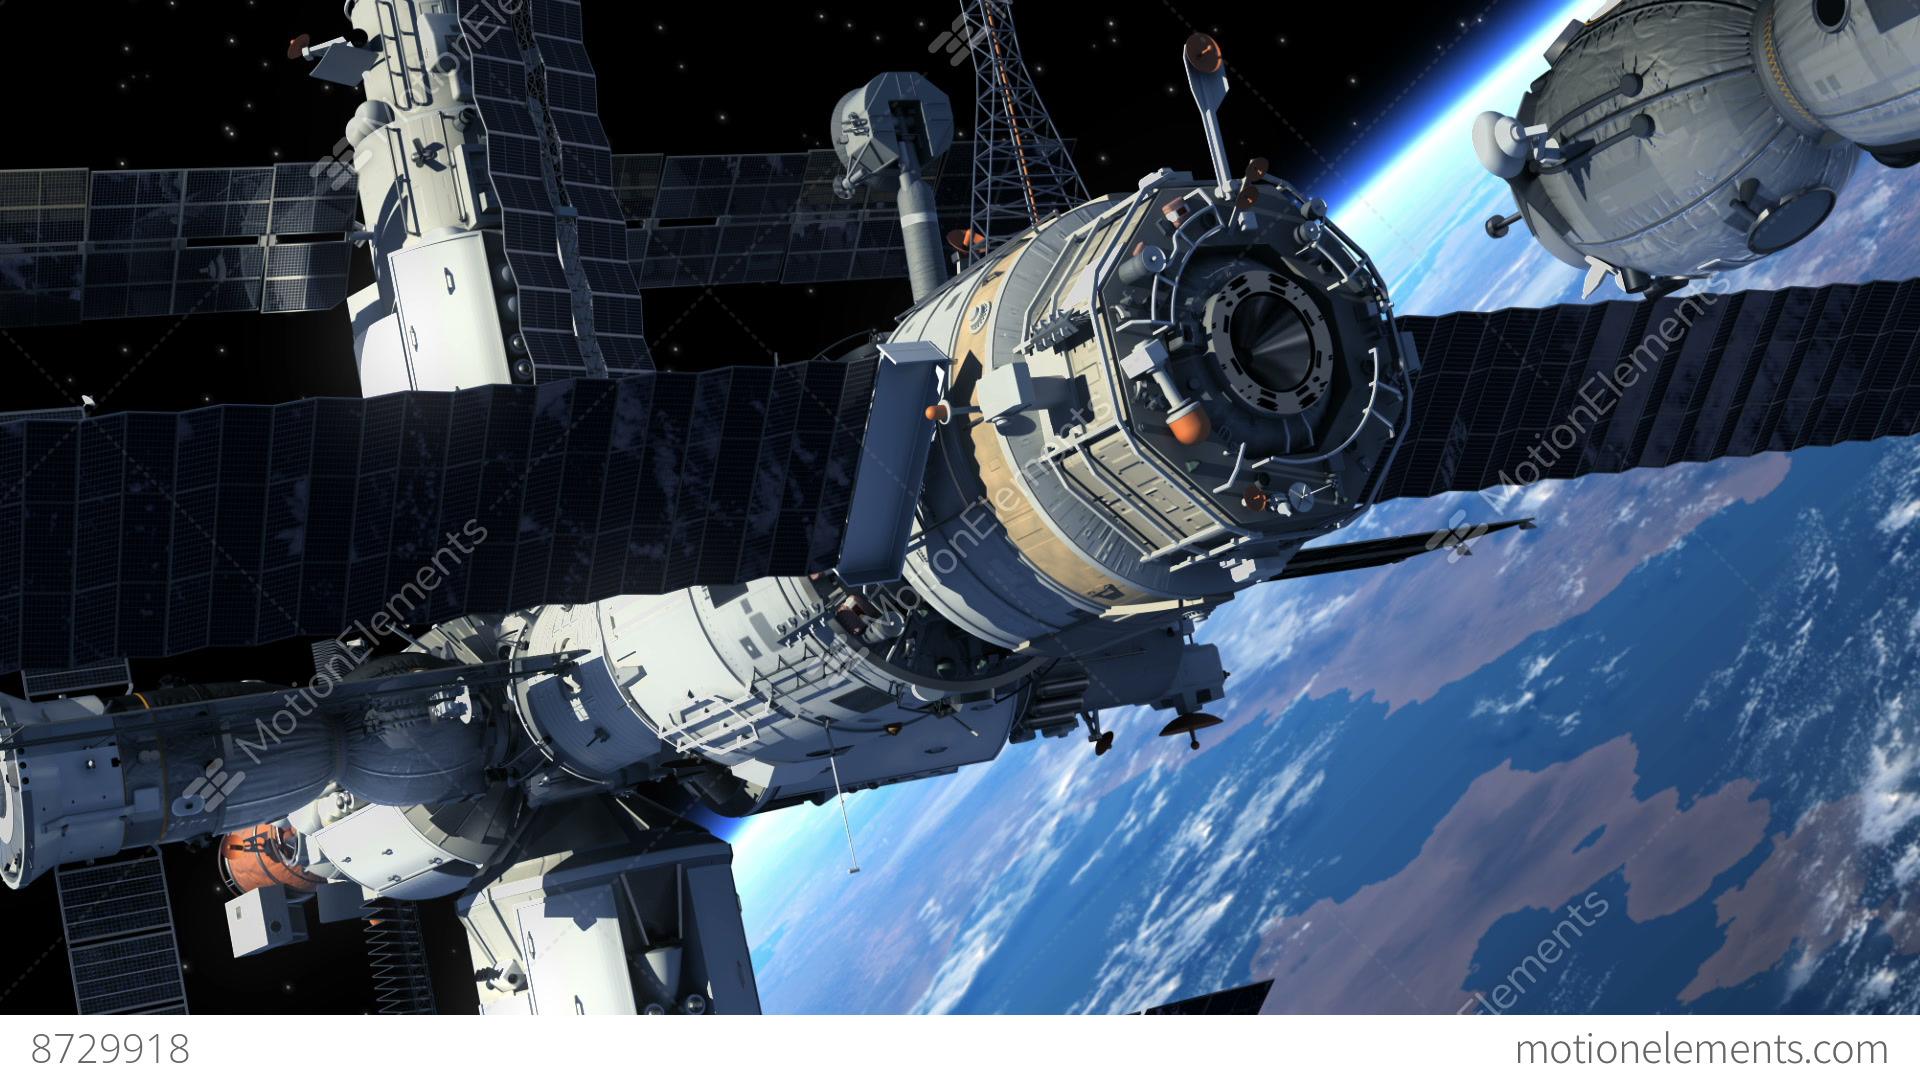 inside space ship docking station - photo #11